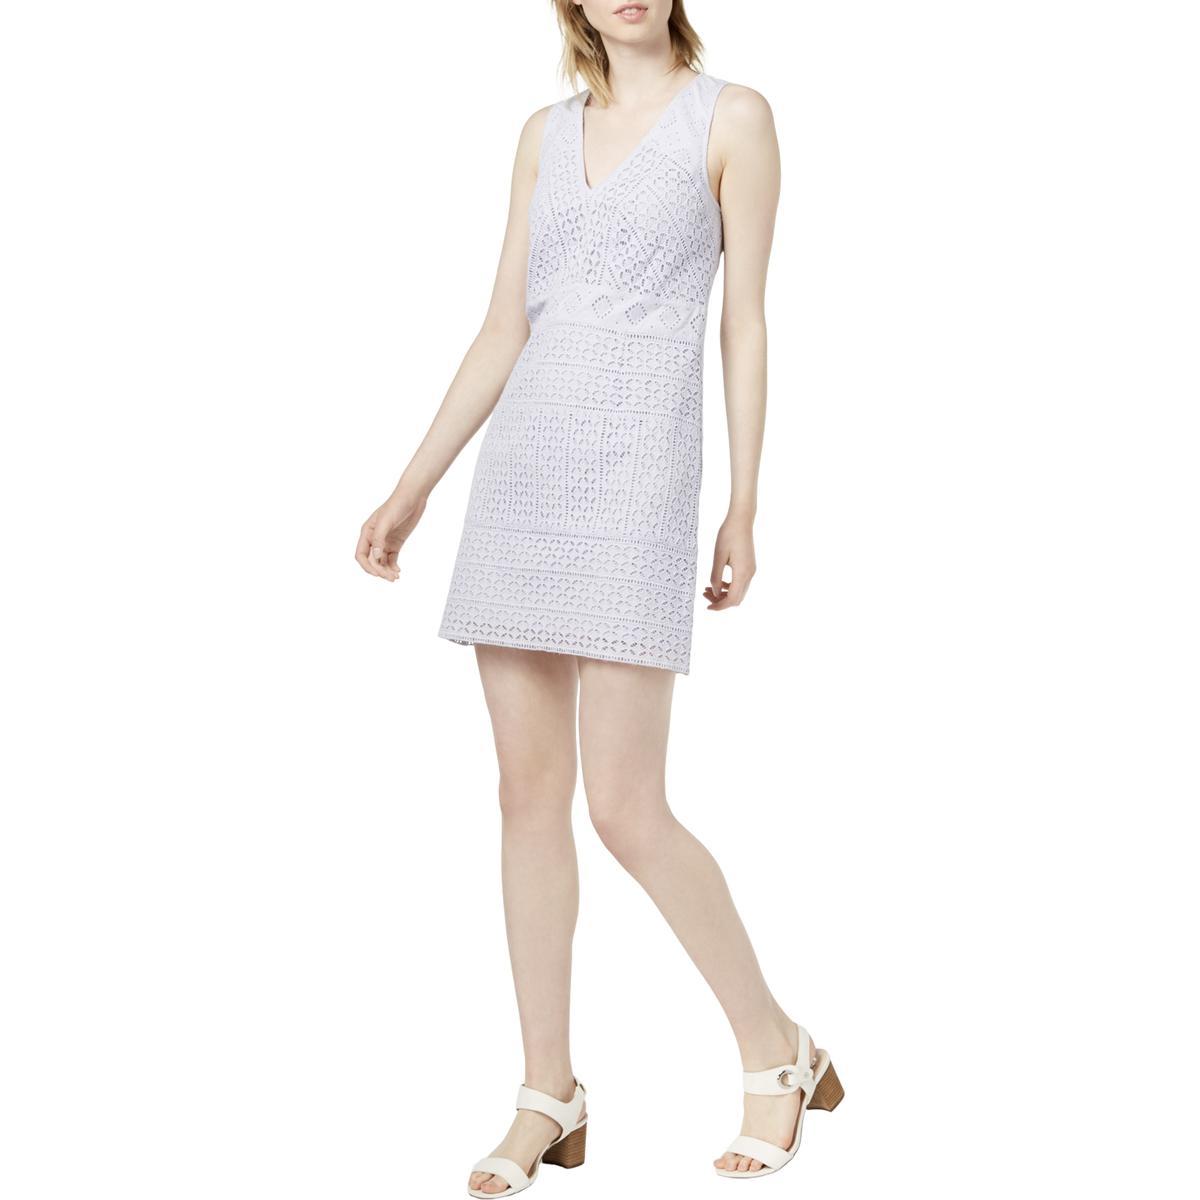 ed2416b5cc BHFO  French Connection Womens V-Neck Lace Mini Dress